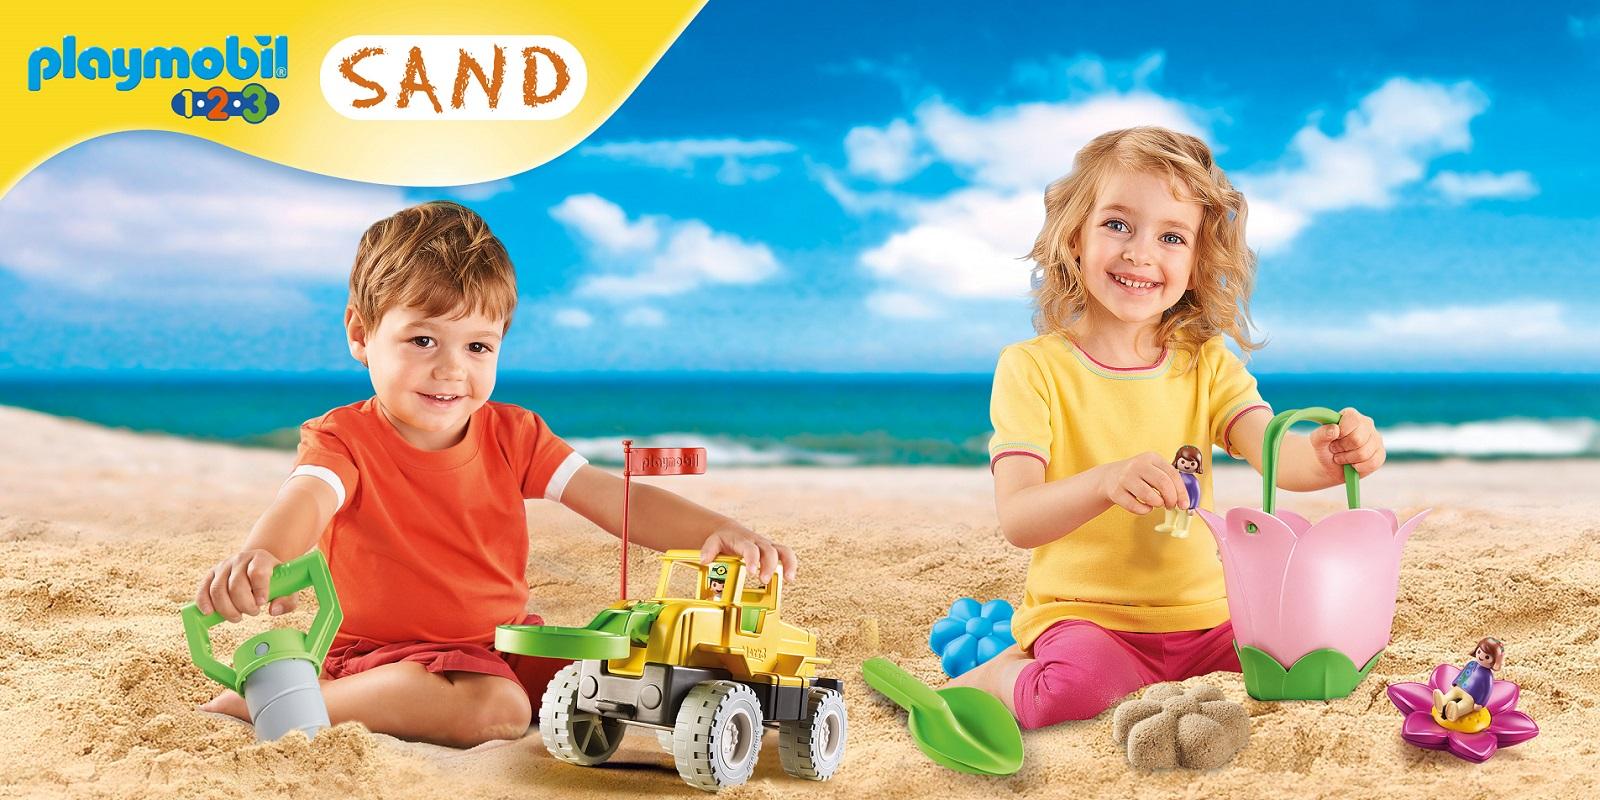 1.2.3 Sand